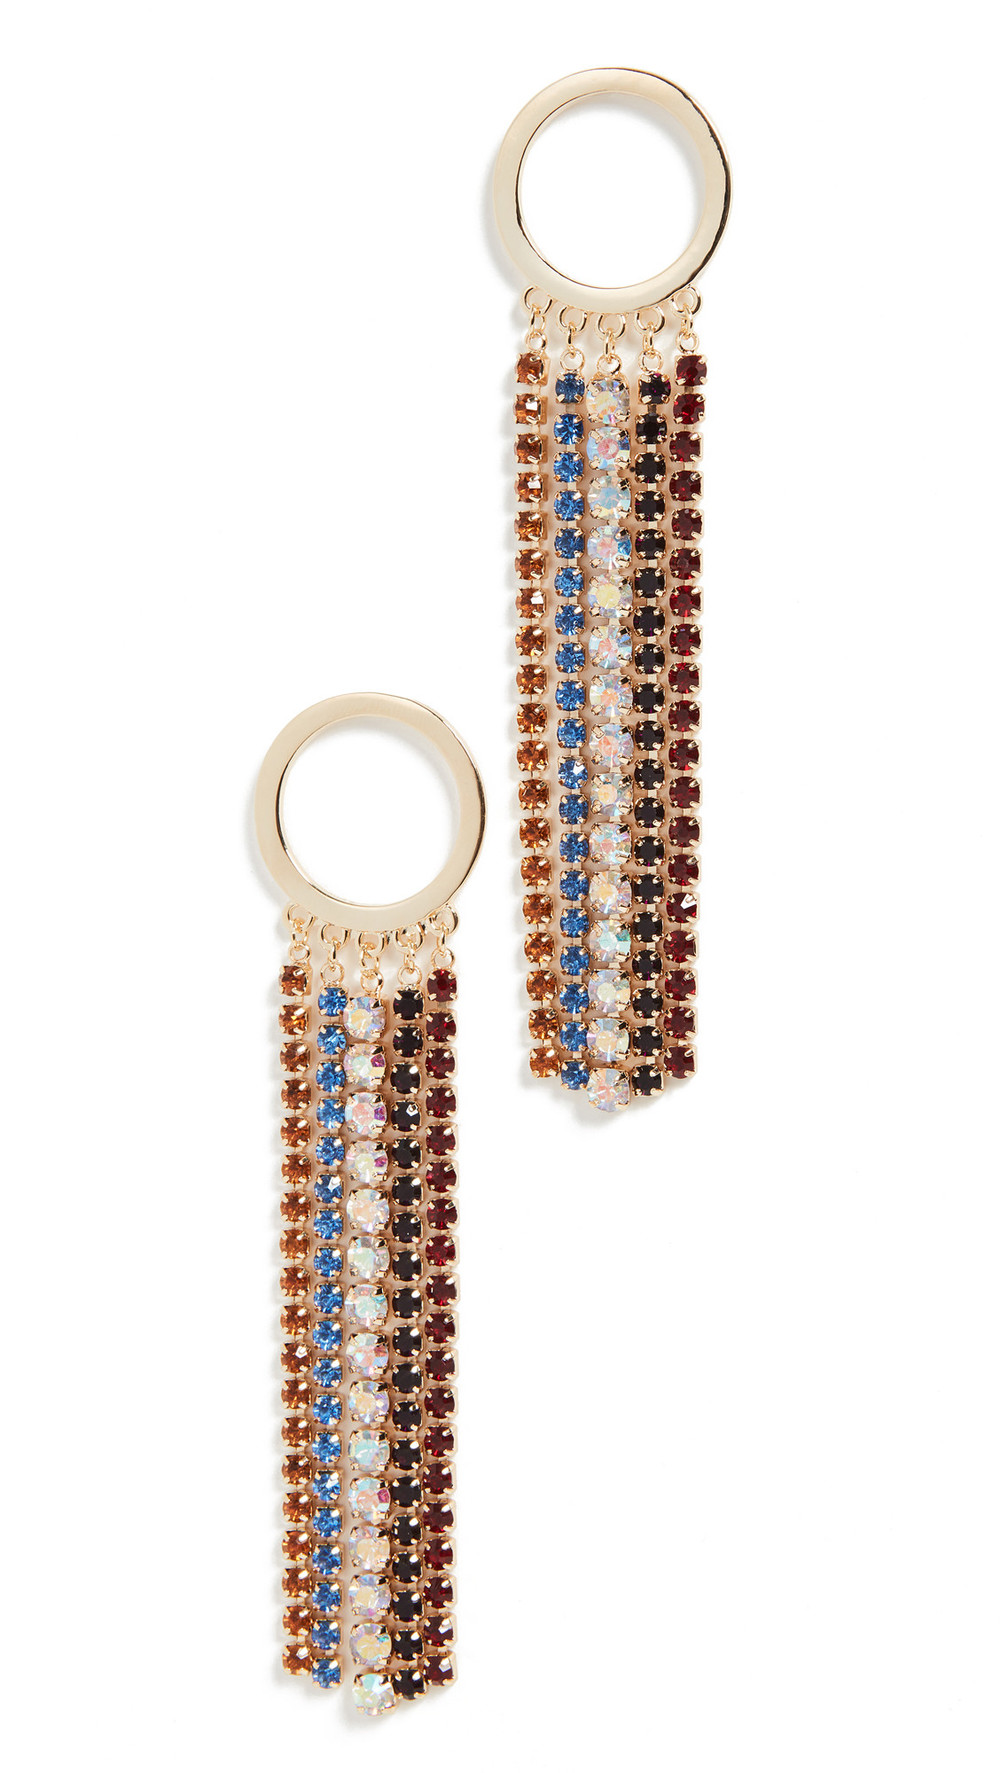 Jules Smith Rainbow Fringe Earrings in gold